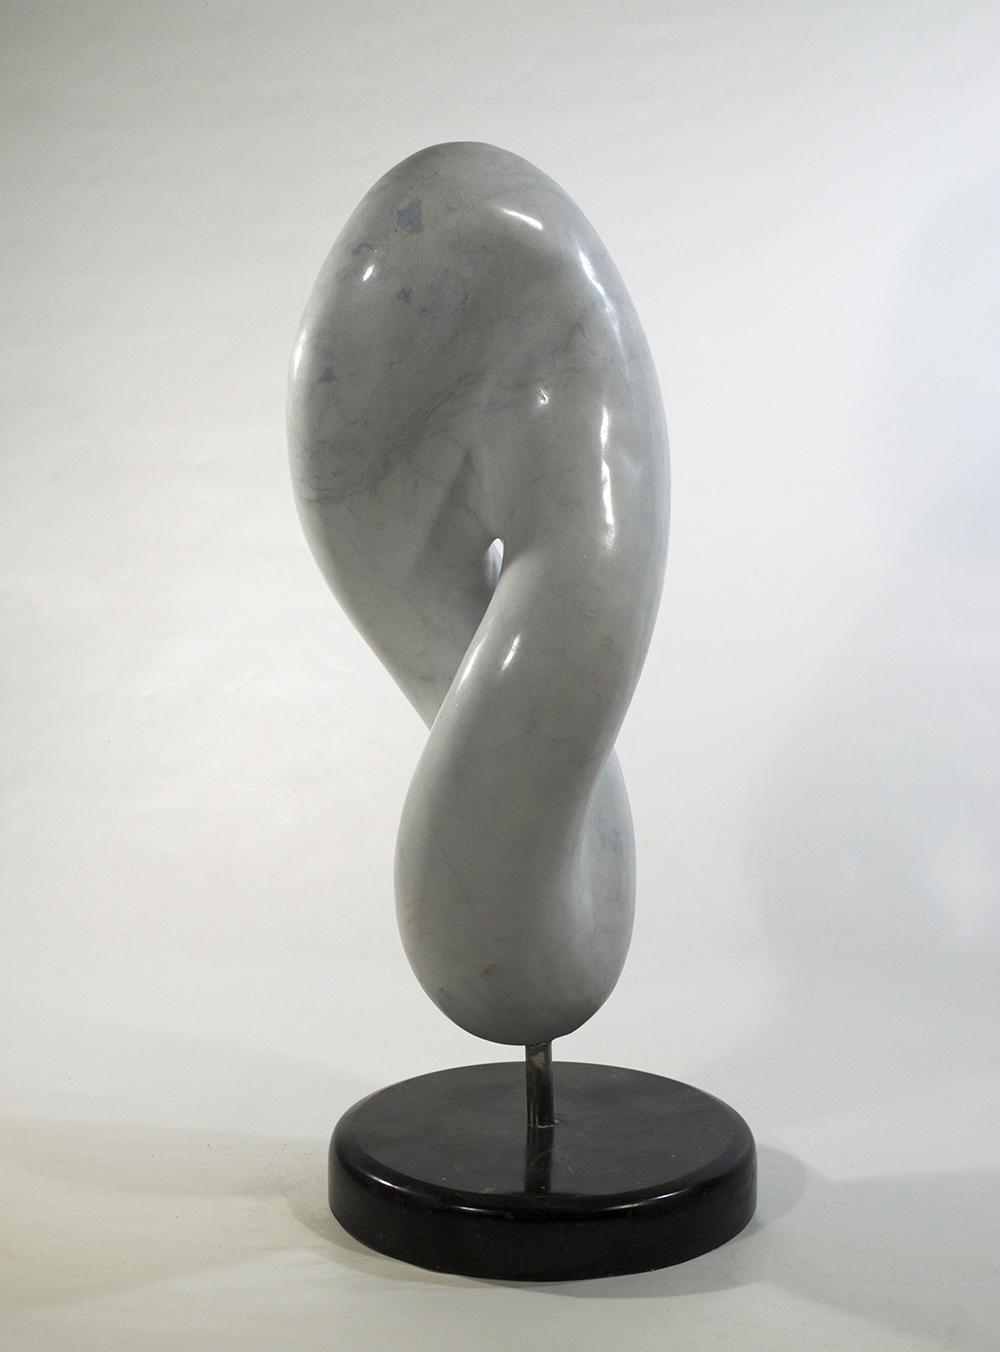 MarbleSculpture_4